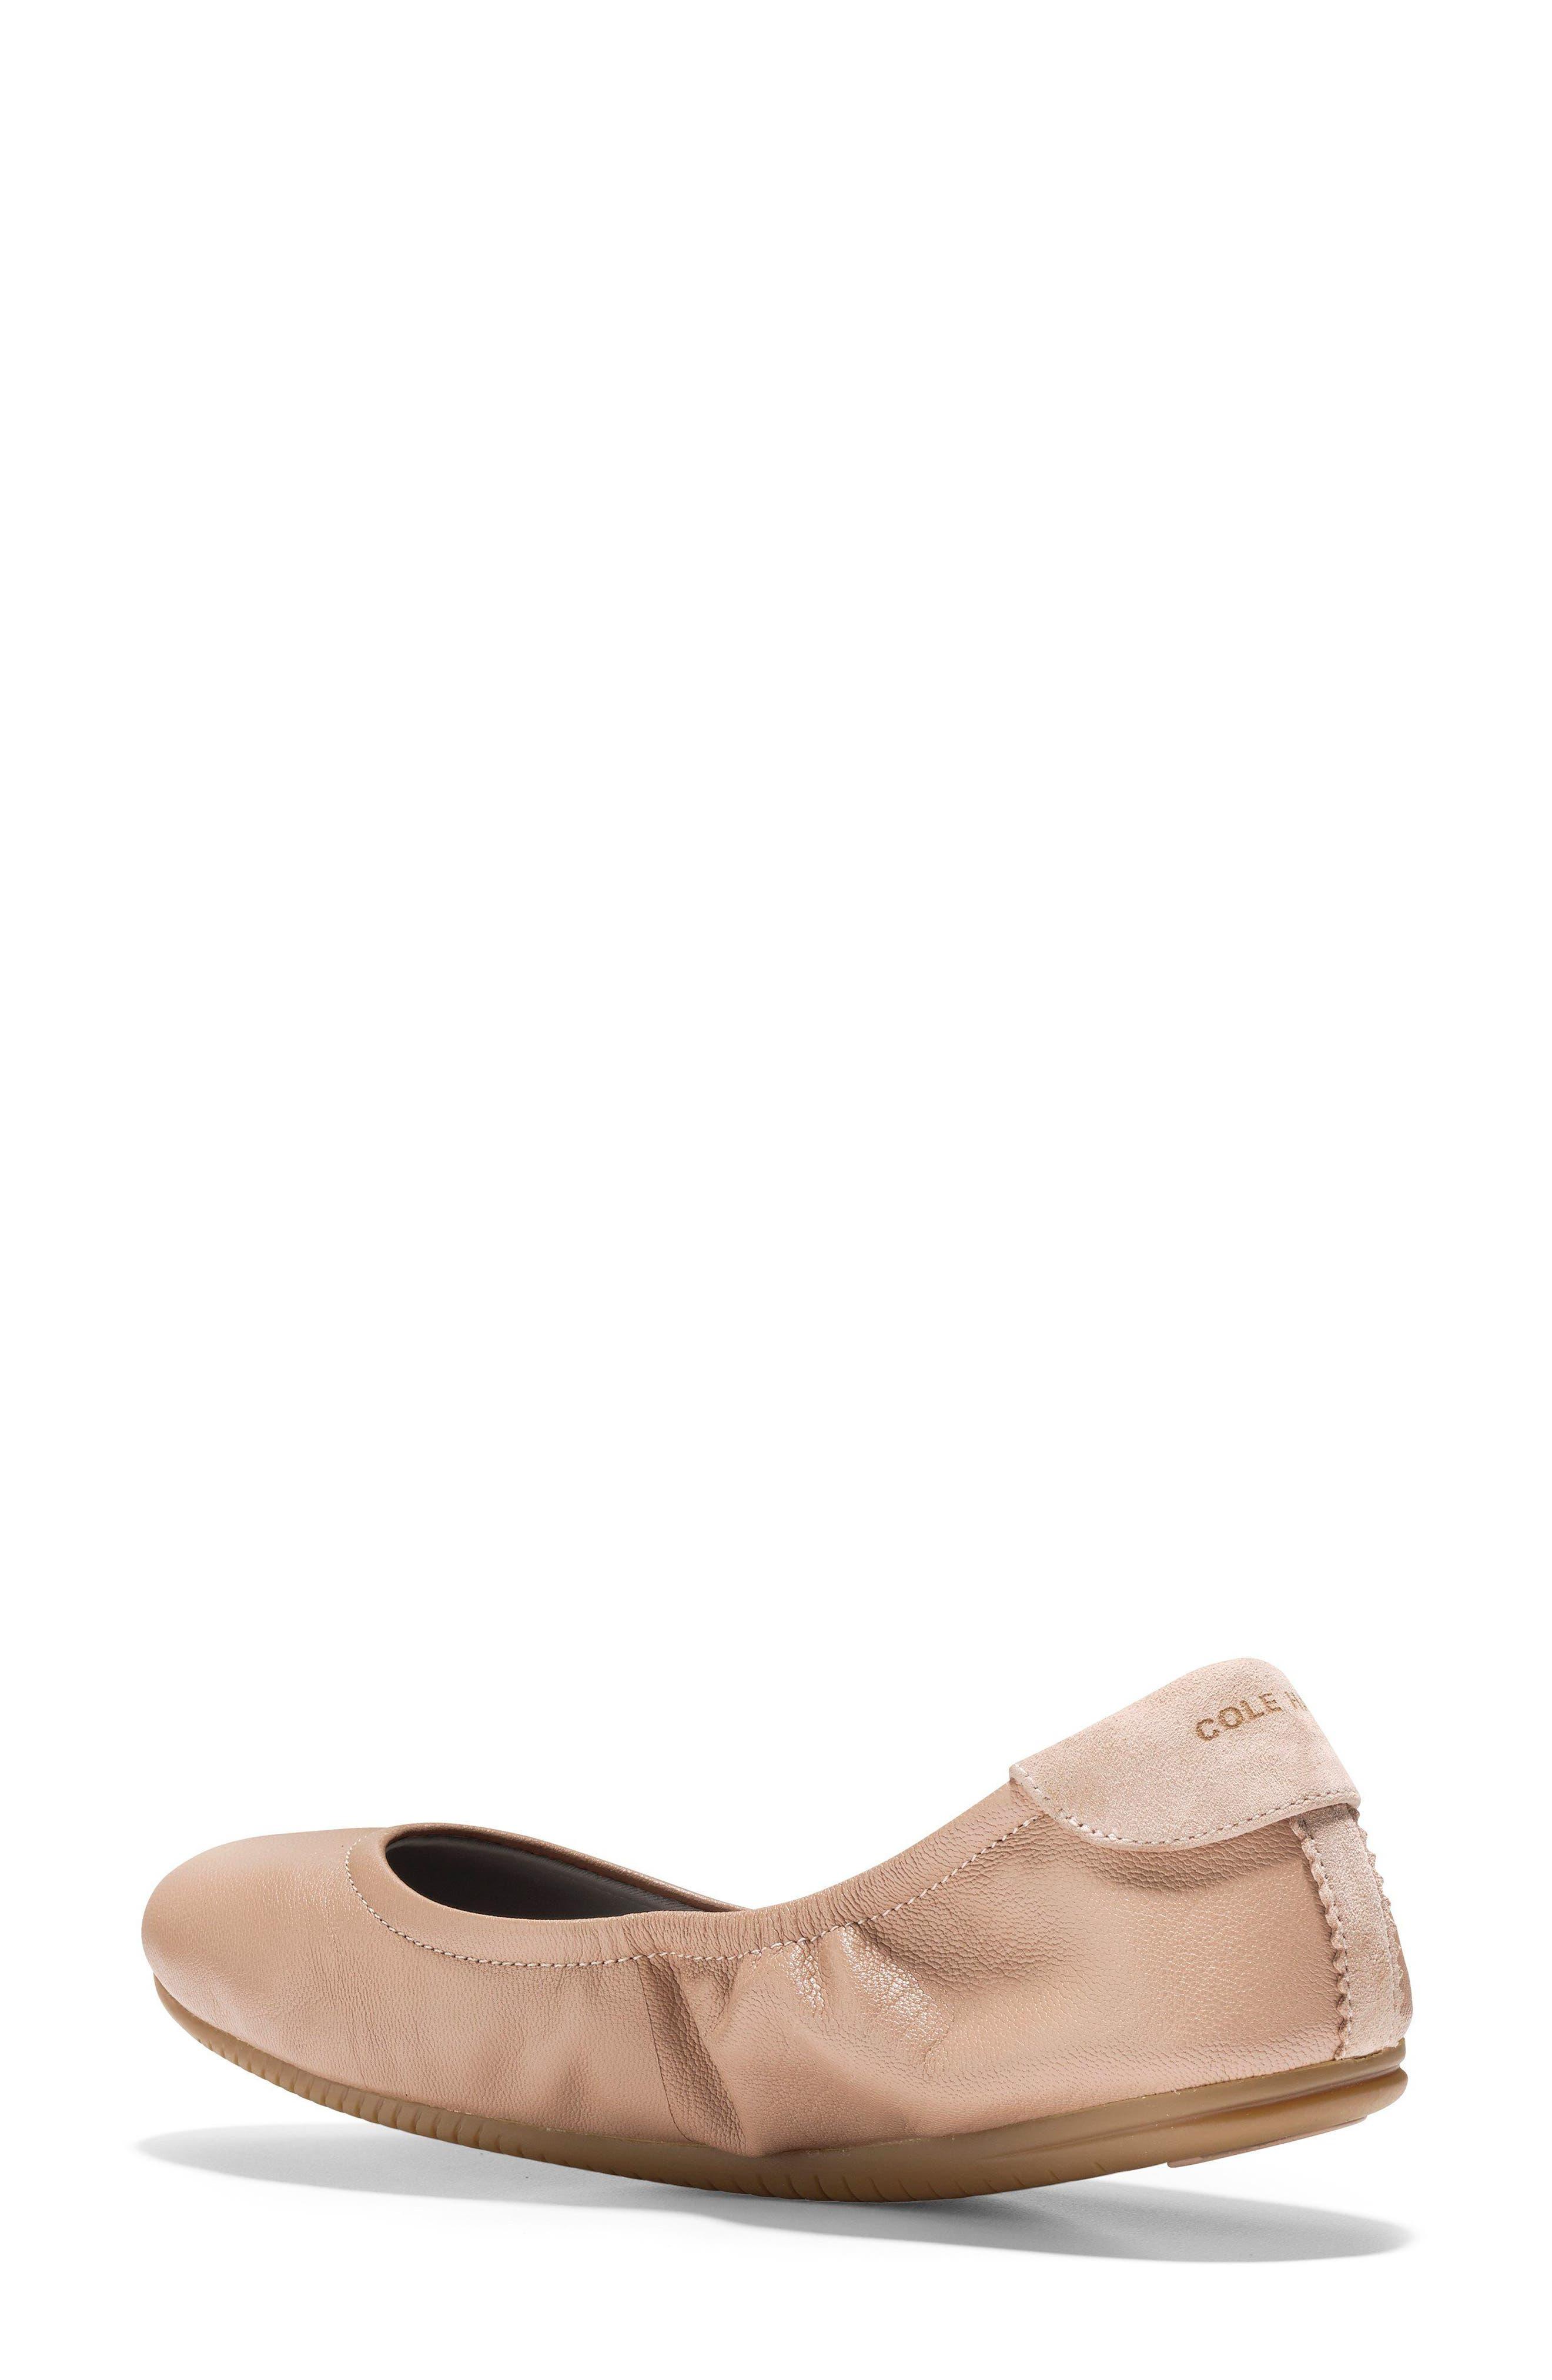 Studiogrand Ballet Flat,                             Alternate thumbnail 2, color,                             Maple Sugar Leather